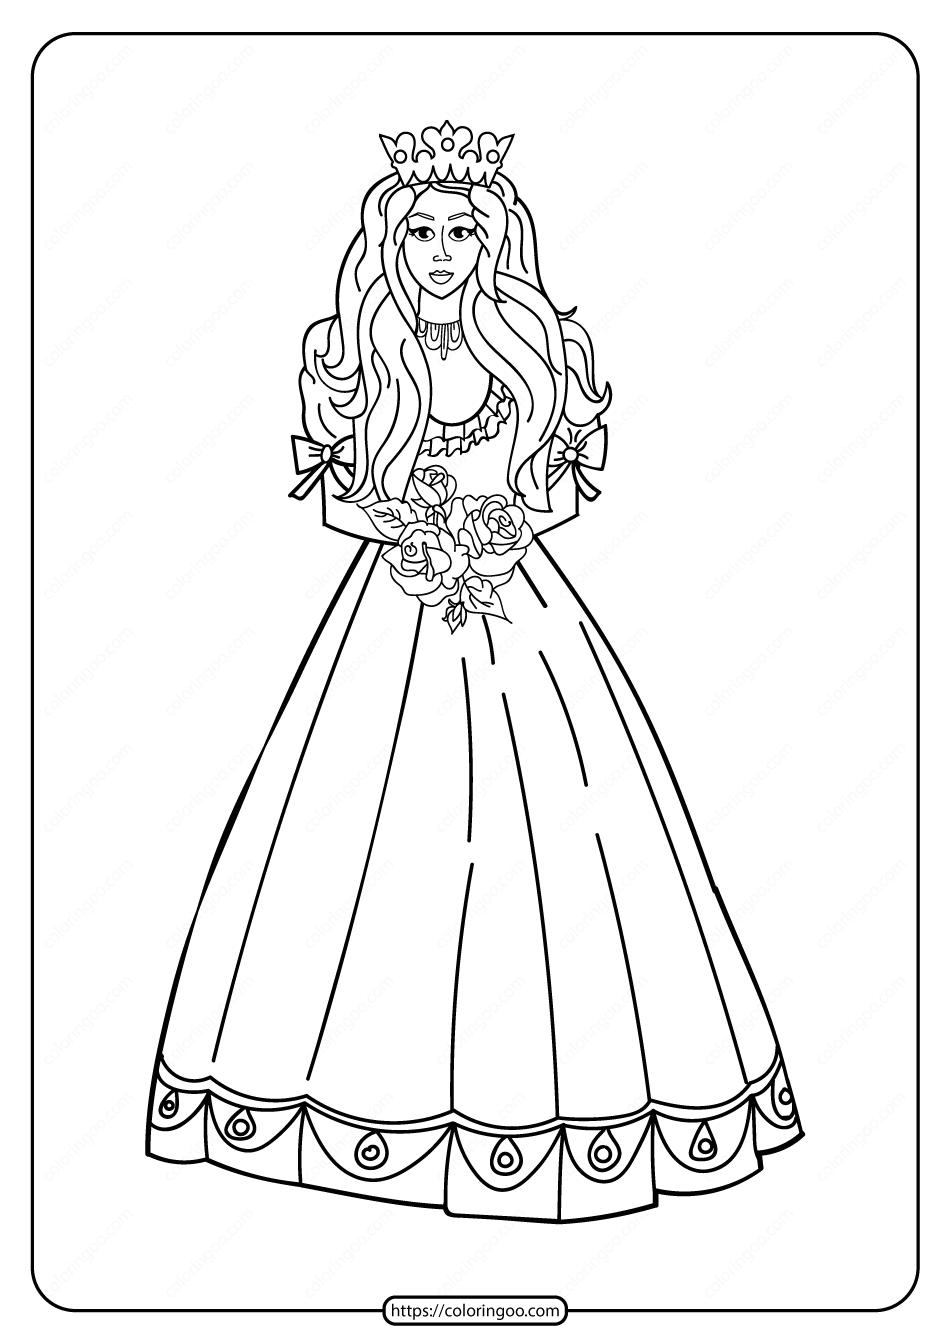 Free Printable Princess Pdf Coloring Pages 08